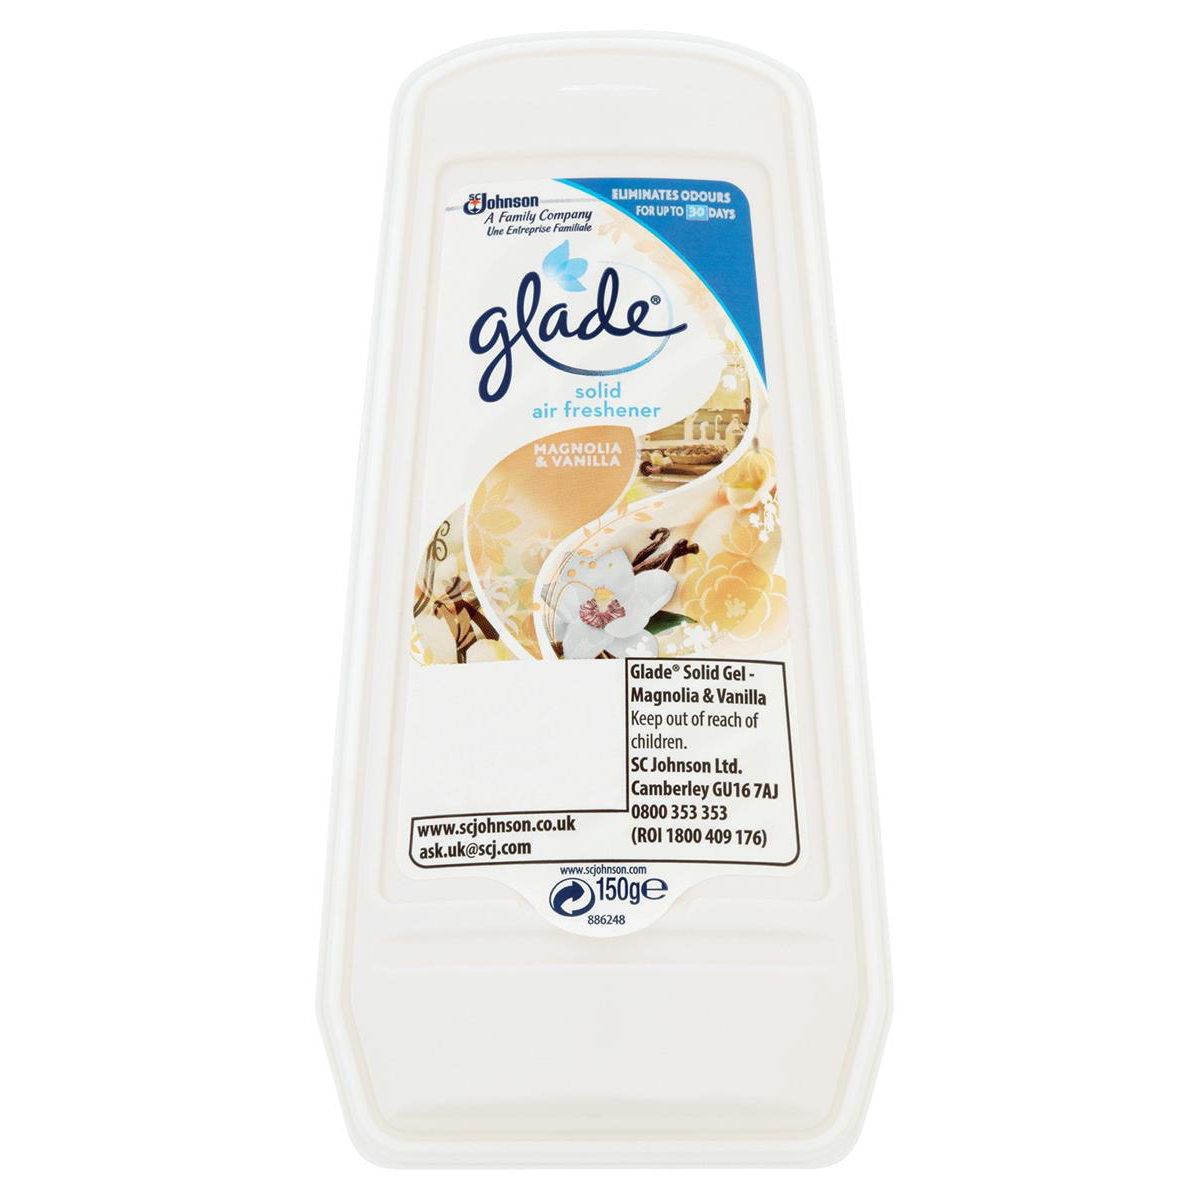 Image for Glade Gel Air Freshener Vanilla/Magnolia Ref 336107